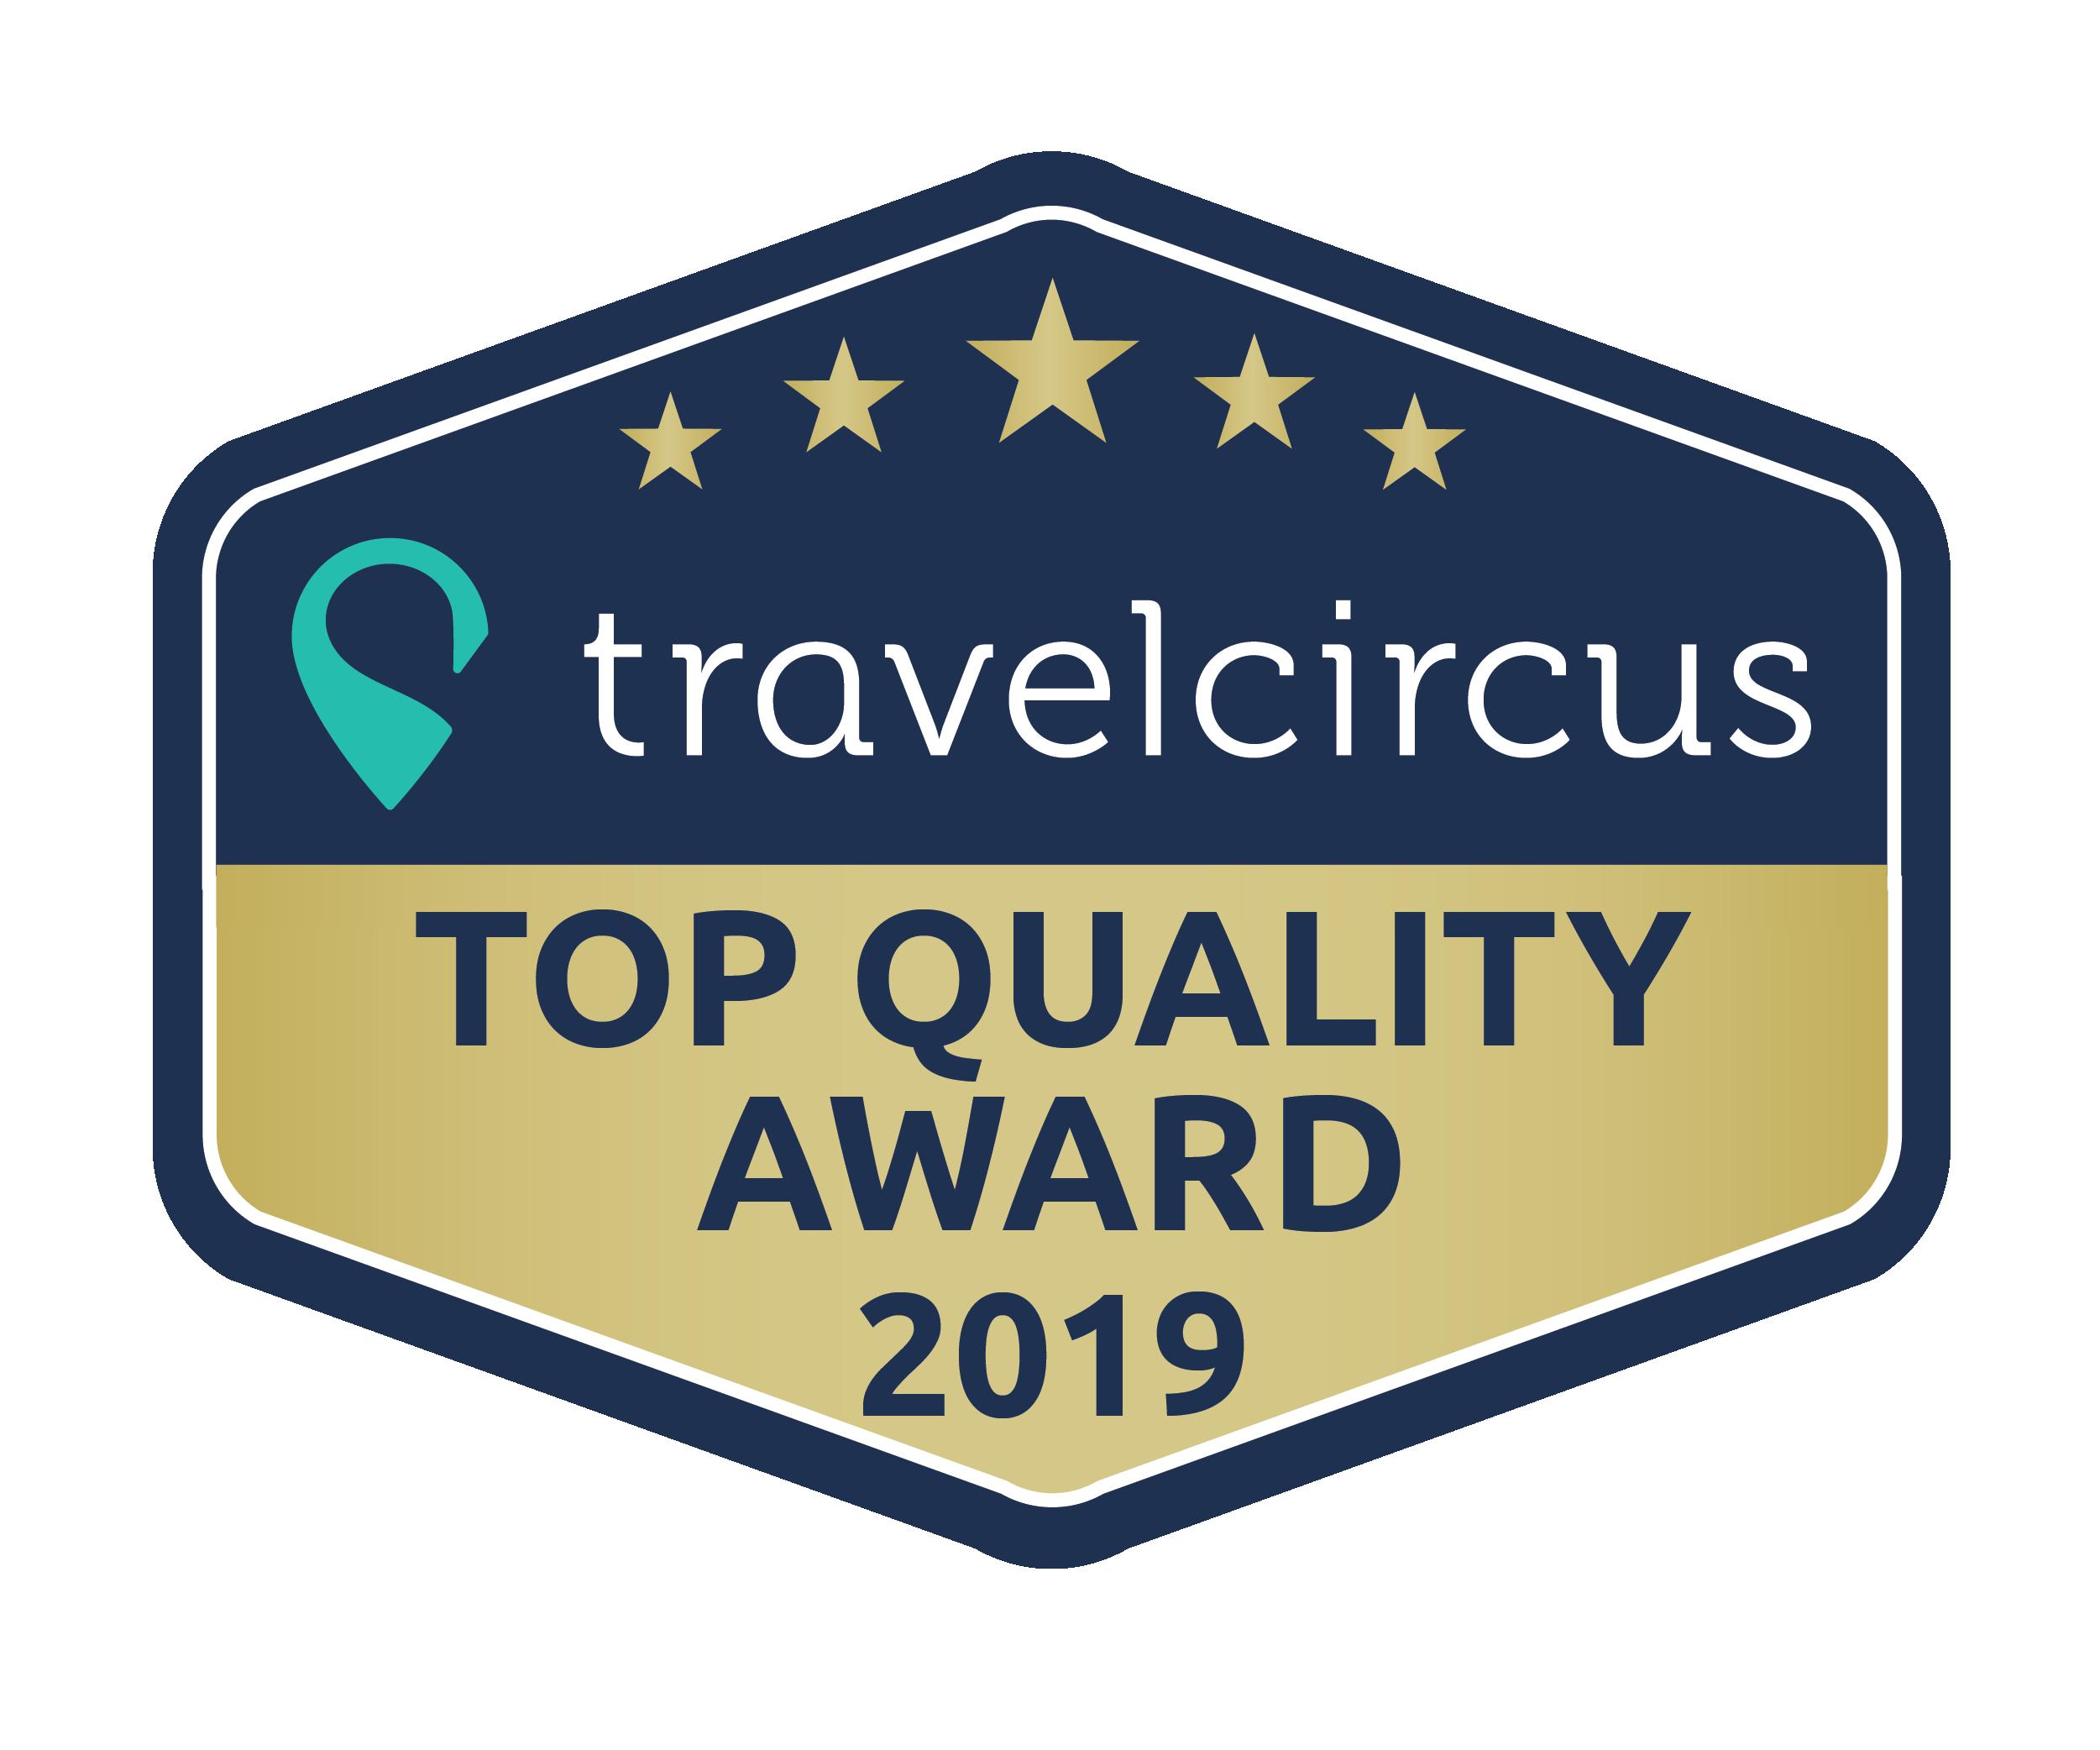 Travelcircus Quality Award 2019